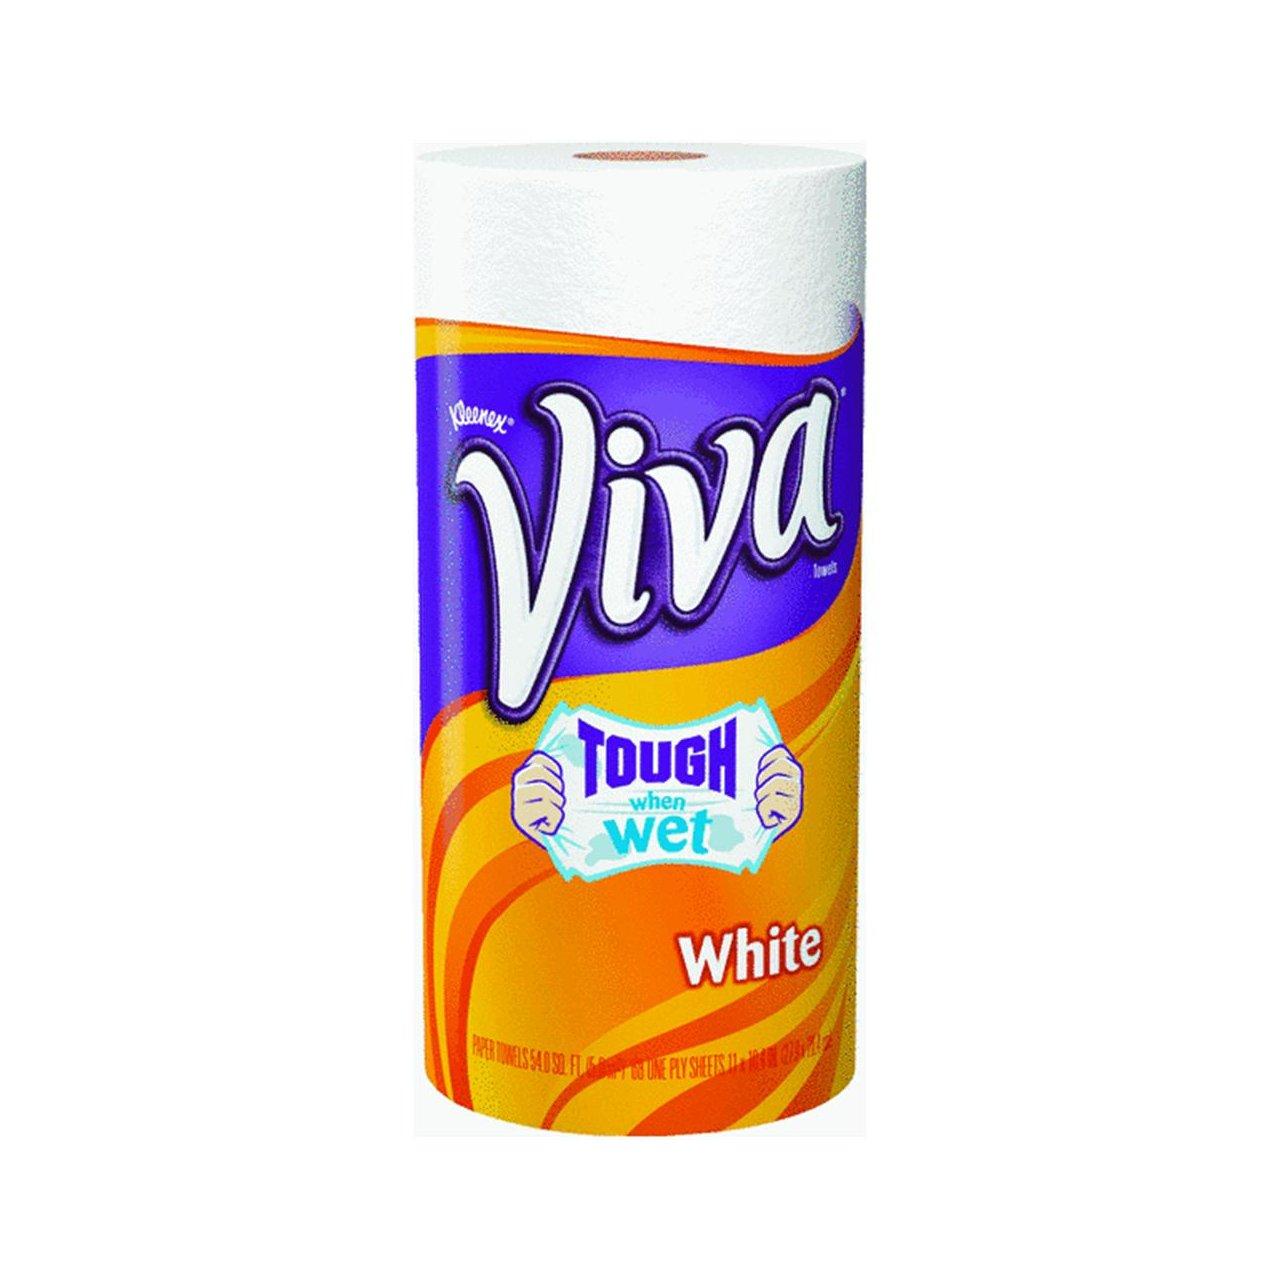 Amazon.com: Viva Paper Towel Big Roll: Home & Kitchen